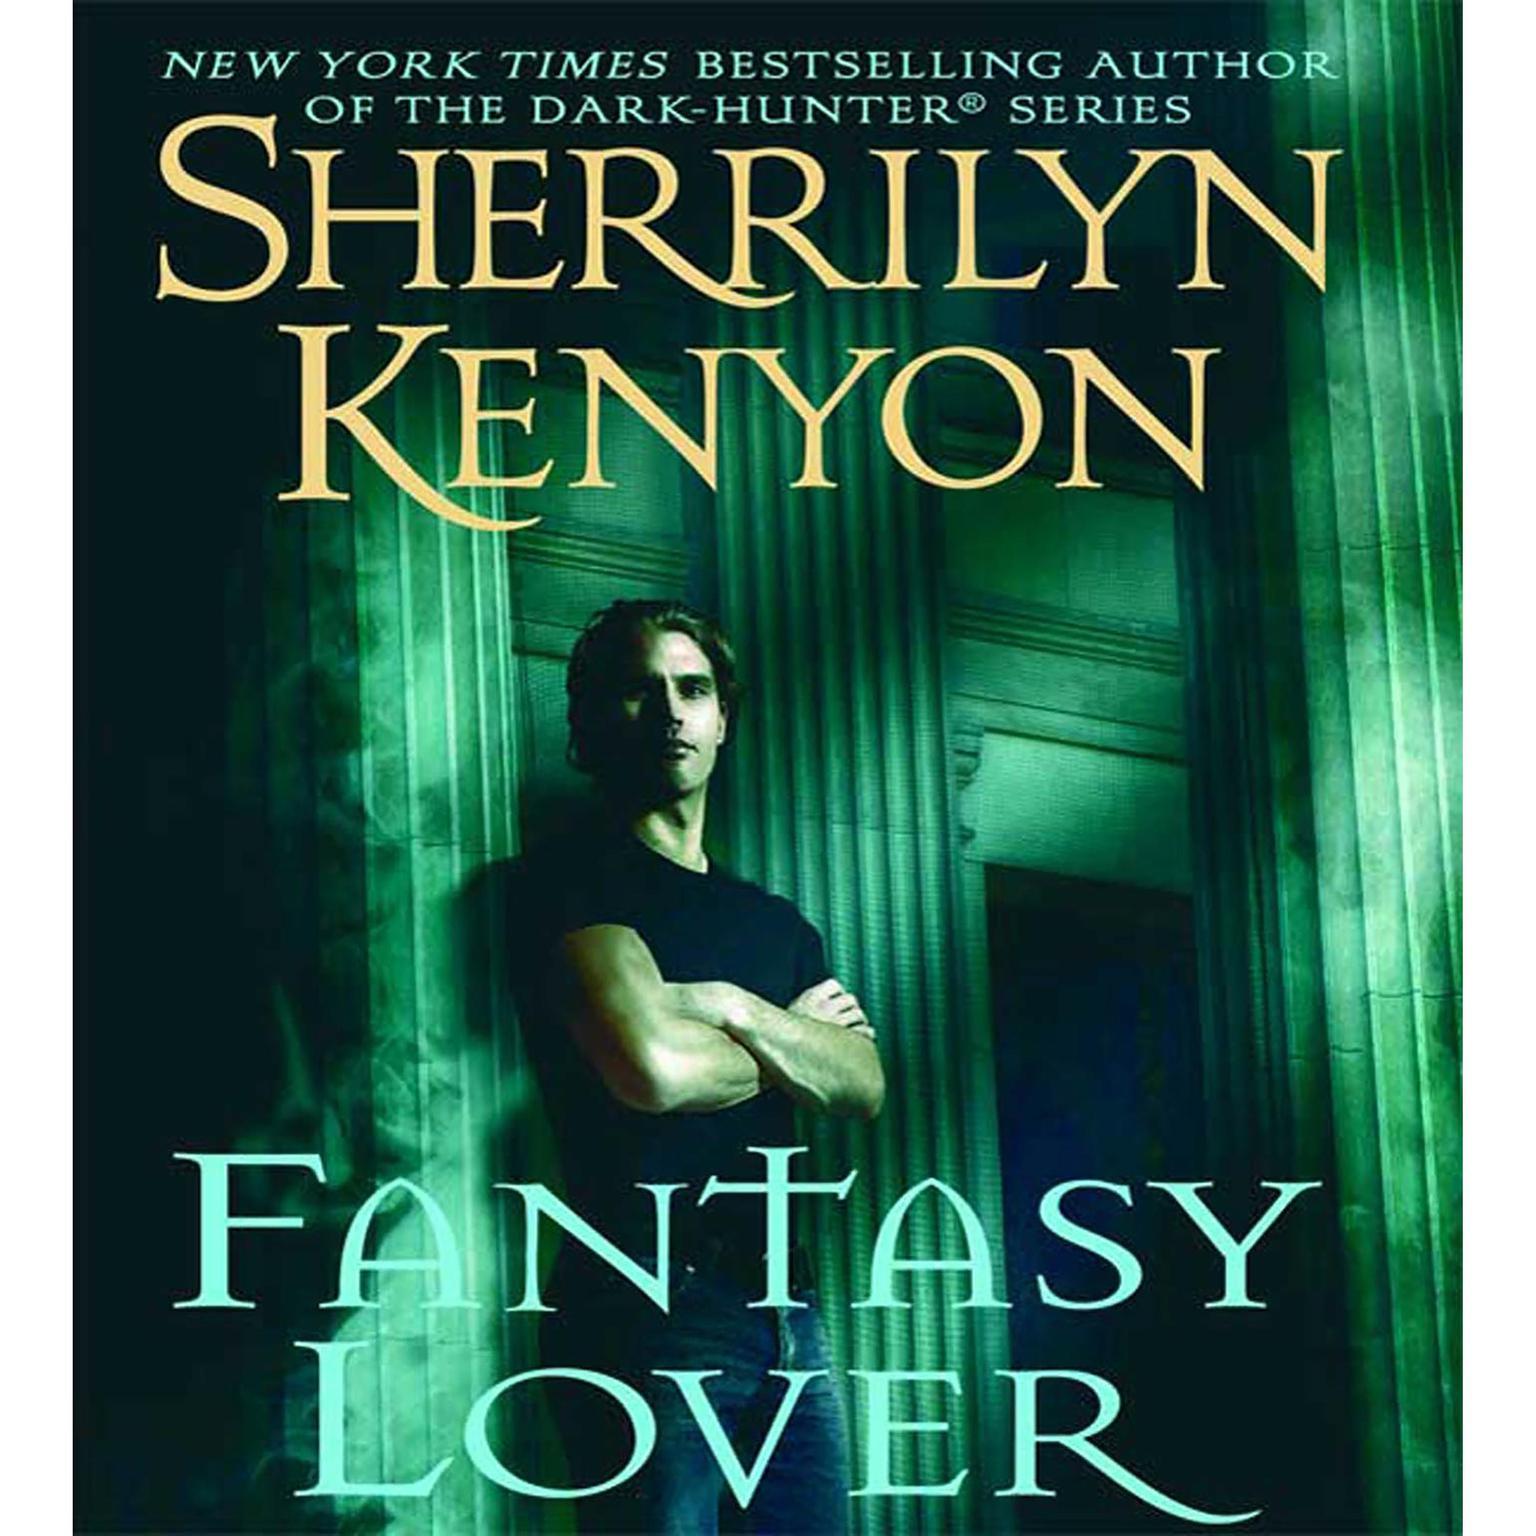 Printable Fantasy Lover Audiobook Cover Art